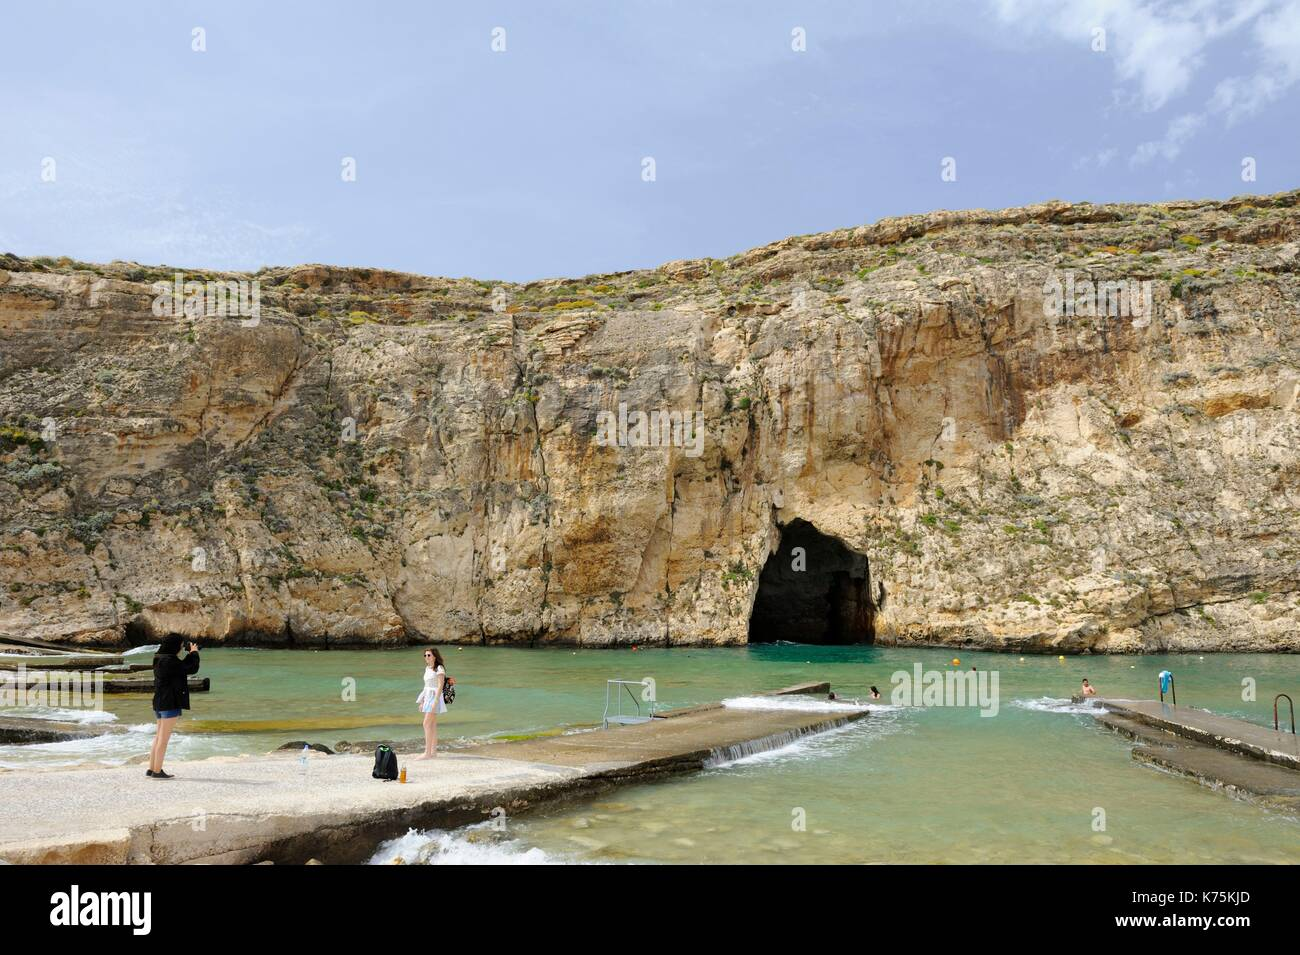 Malta, Island of Gozo, Dwejra, Inland Sea - Stock Image